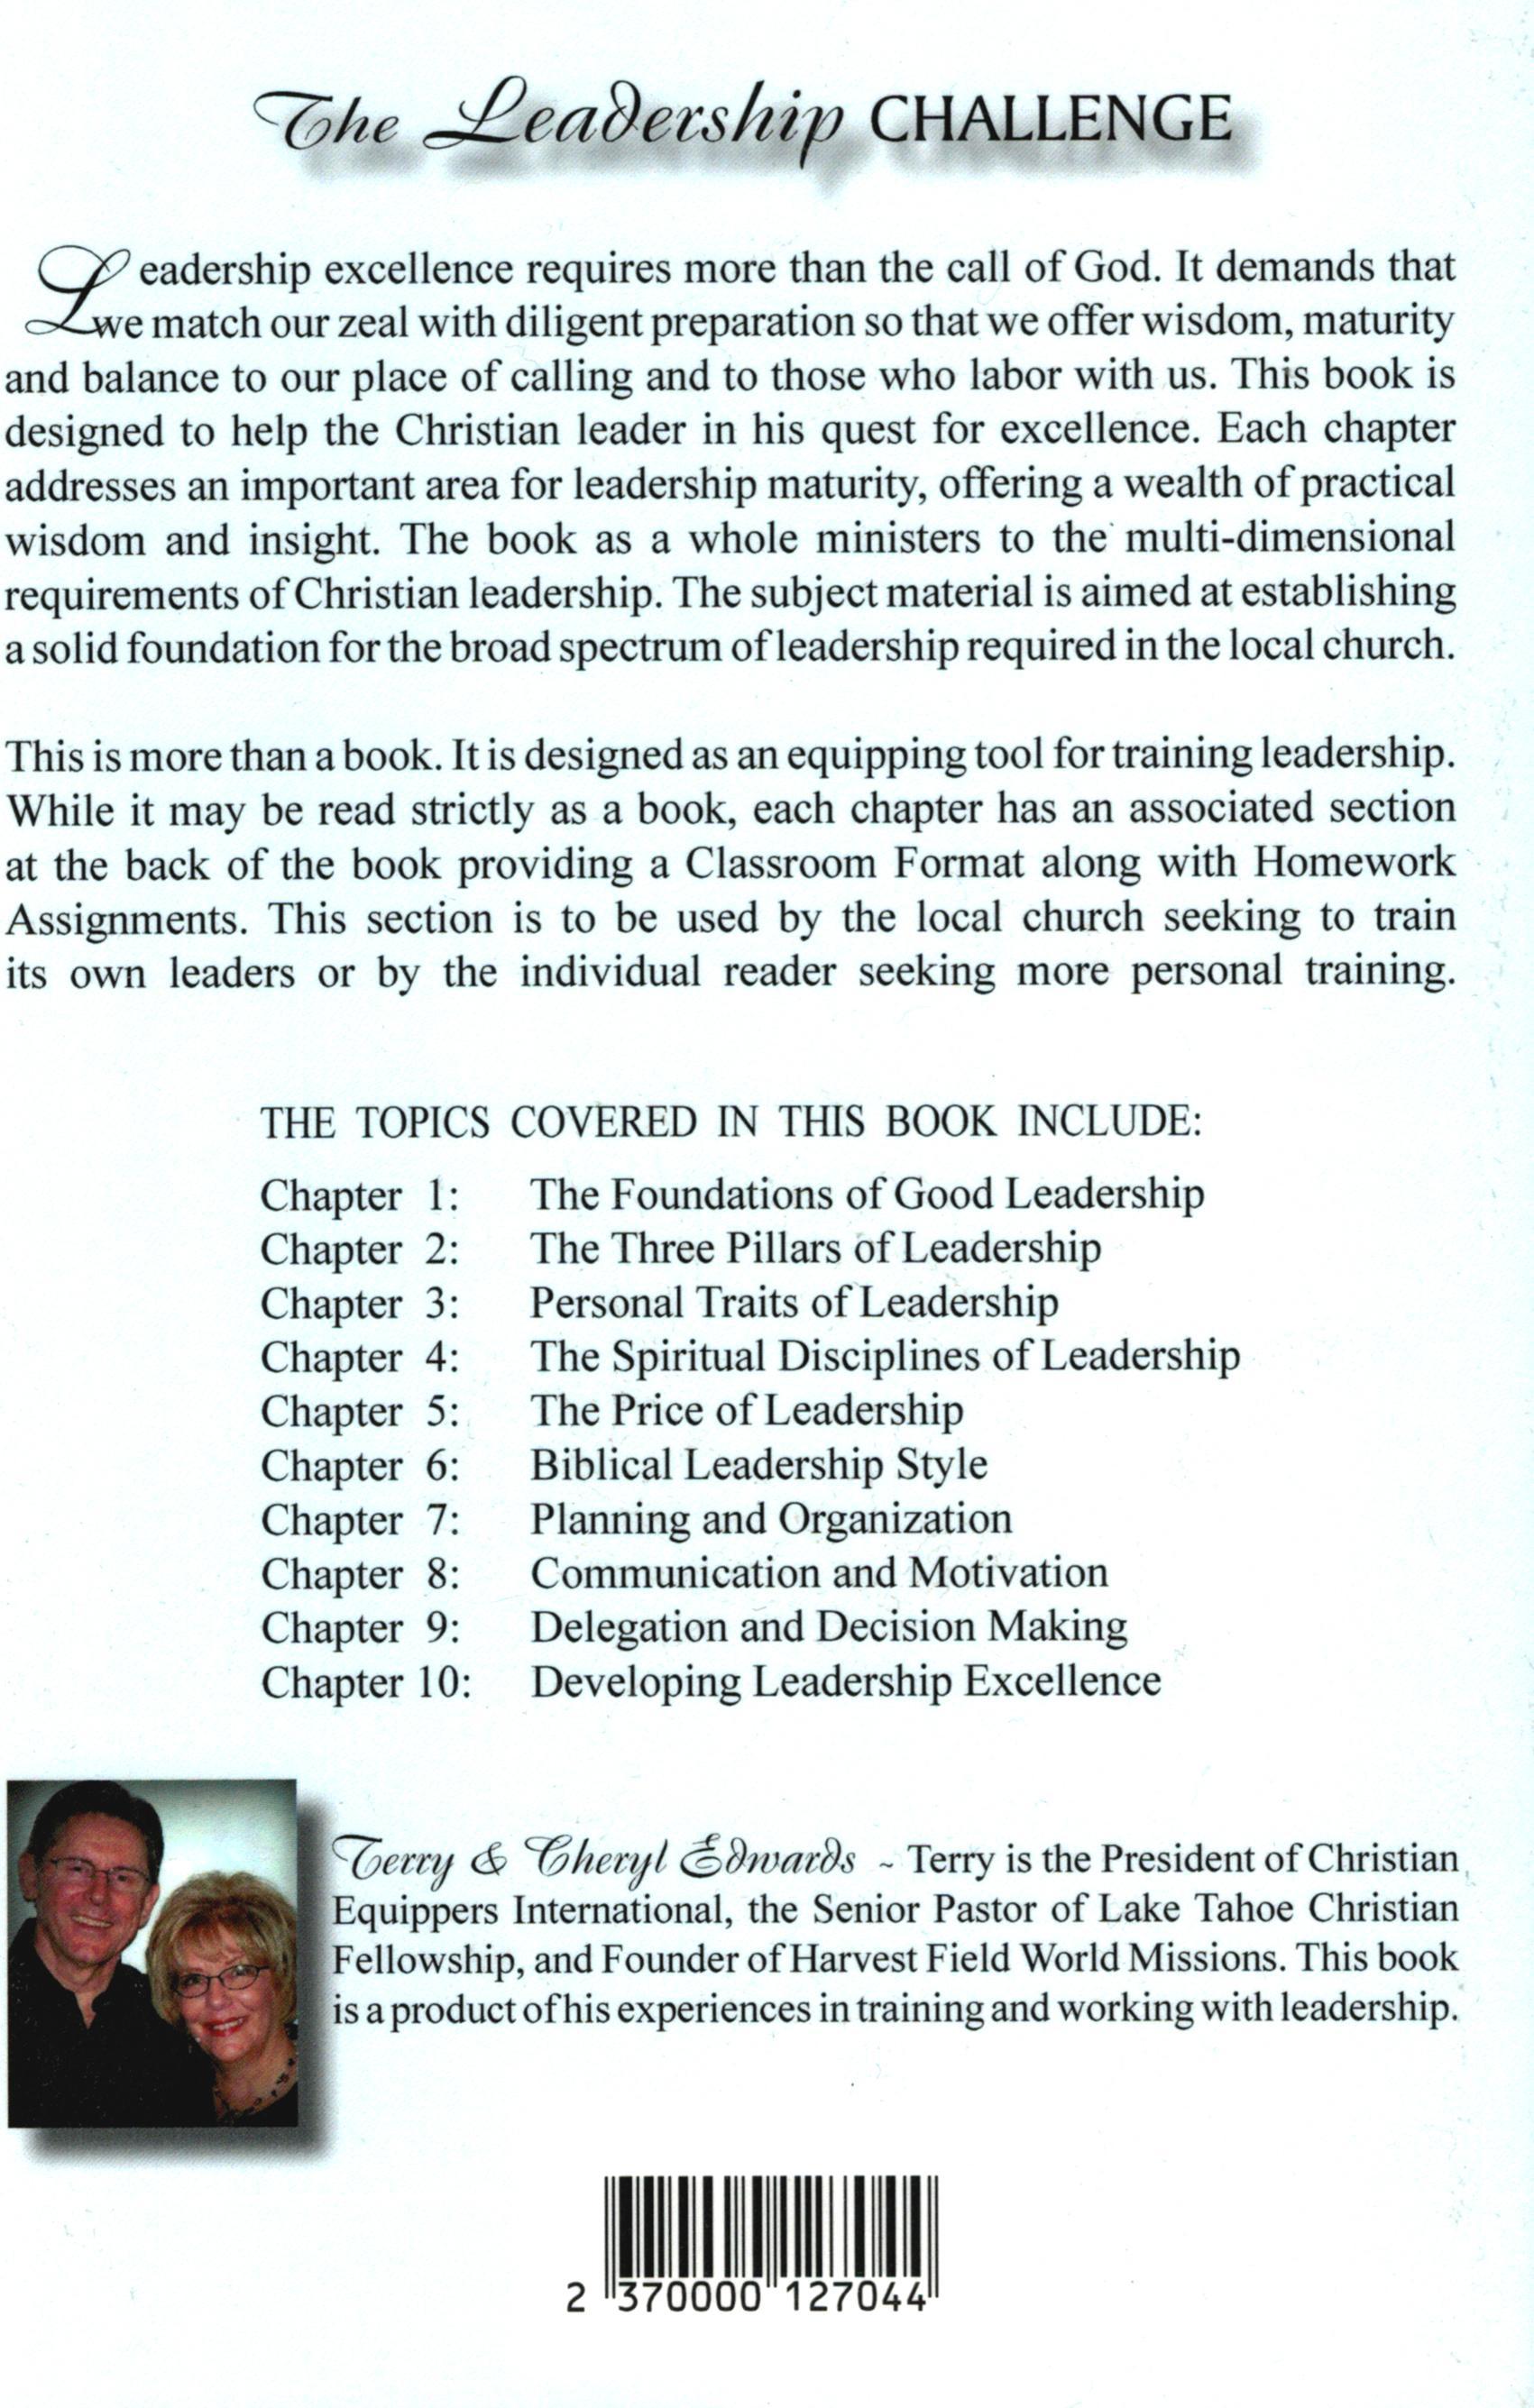 The Leadership Challange